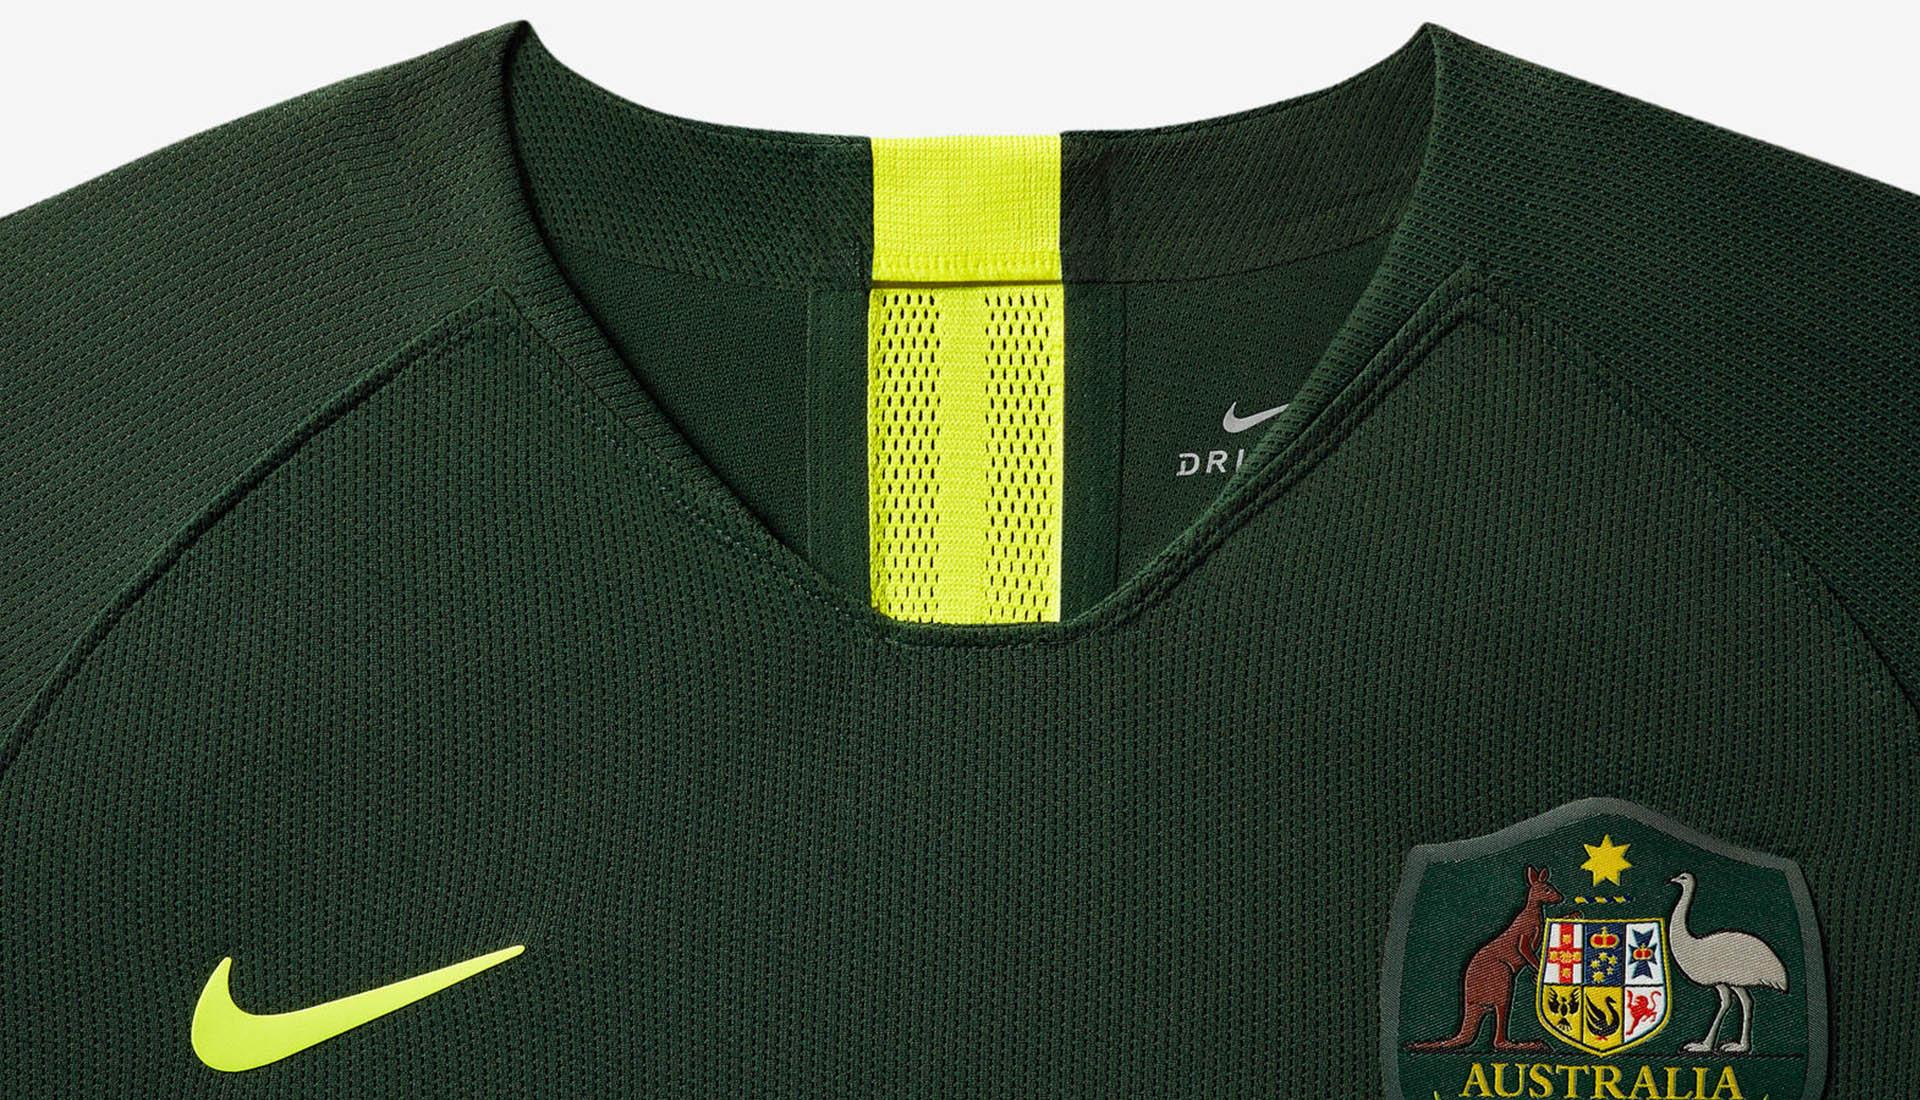 a074d0682 matildas kits 0010 australia-national-team-kit-2019-laydown-1 85905.jpg